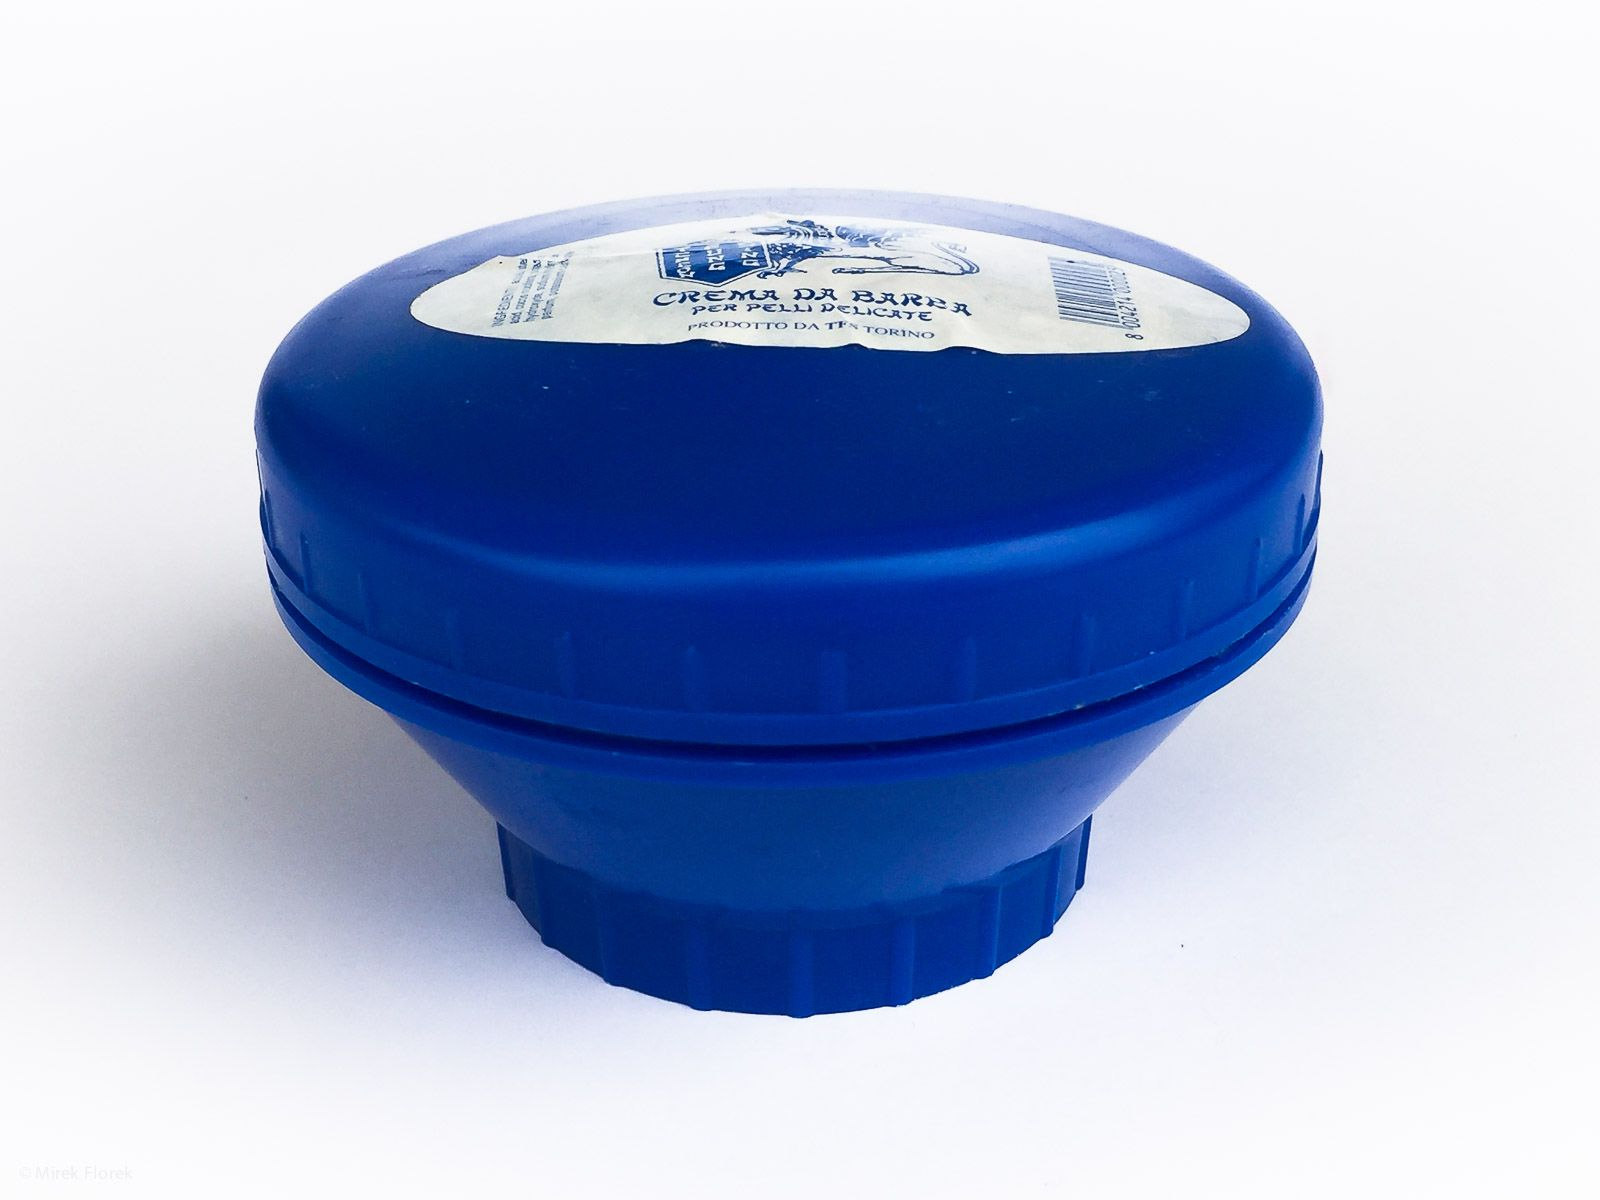 You are currently viewing Tcheon Fung Sing (TFS) Ciotola Blu Crema di Barba (Blue Jar) Shaving Soap – recenzja kremu do golenia